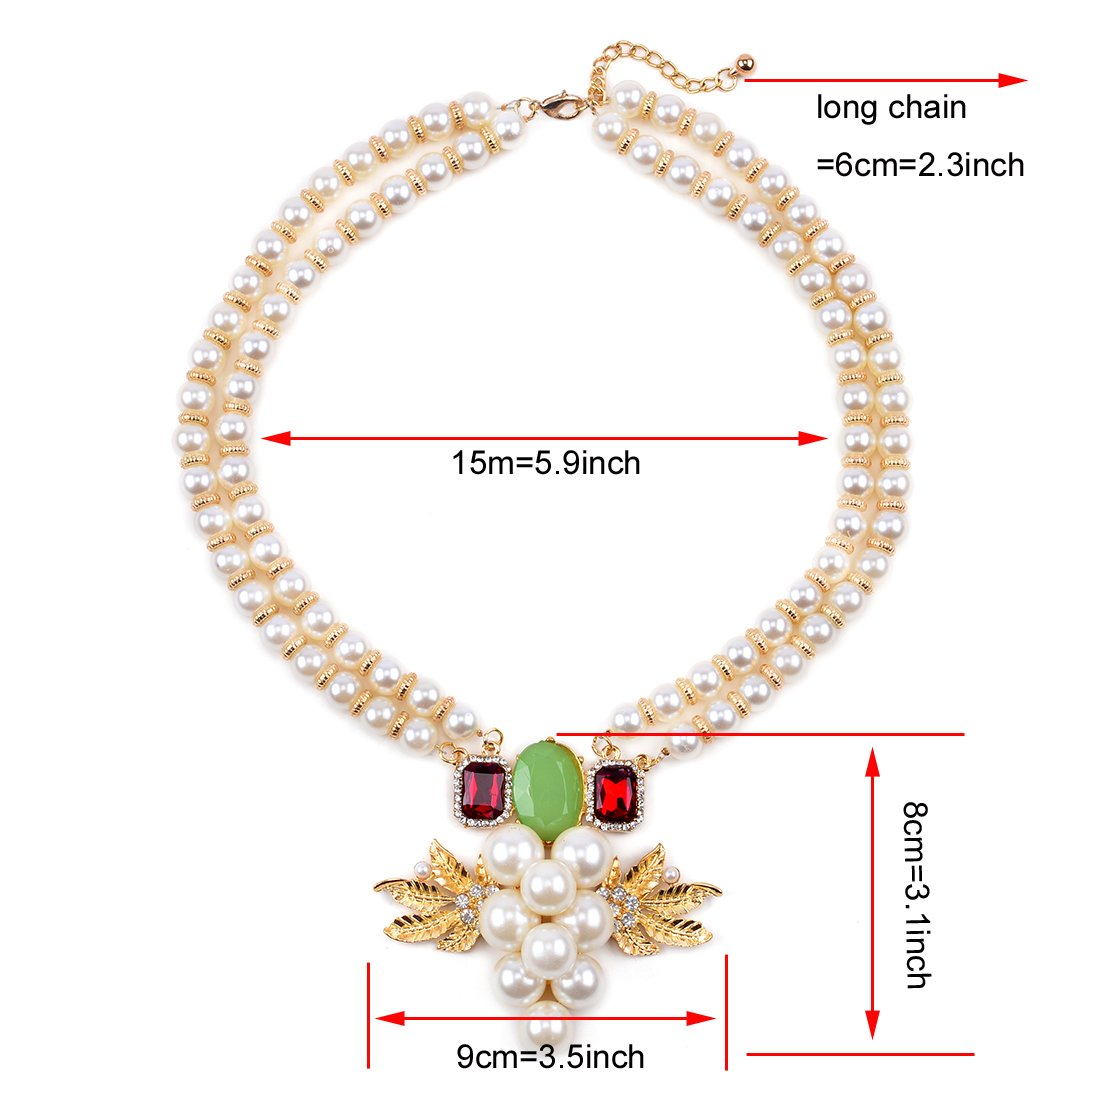 Huan Xun Womens Frutable Grape Pearl Statement Necklace